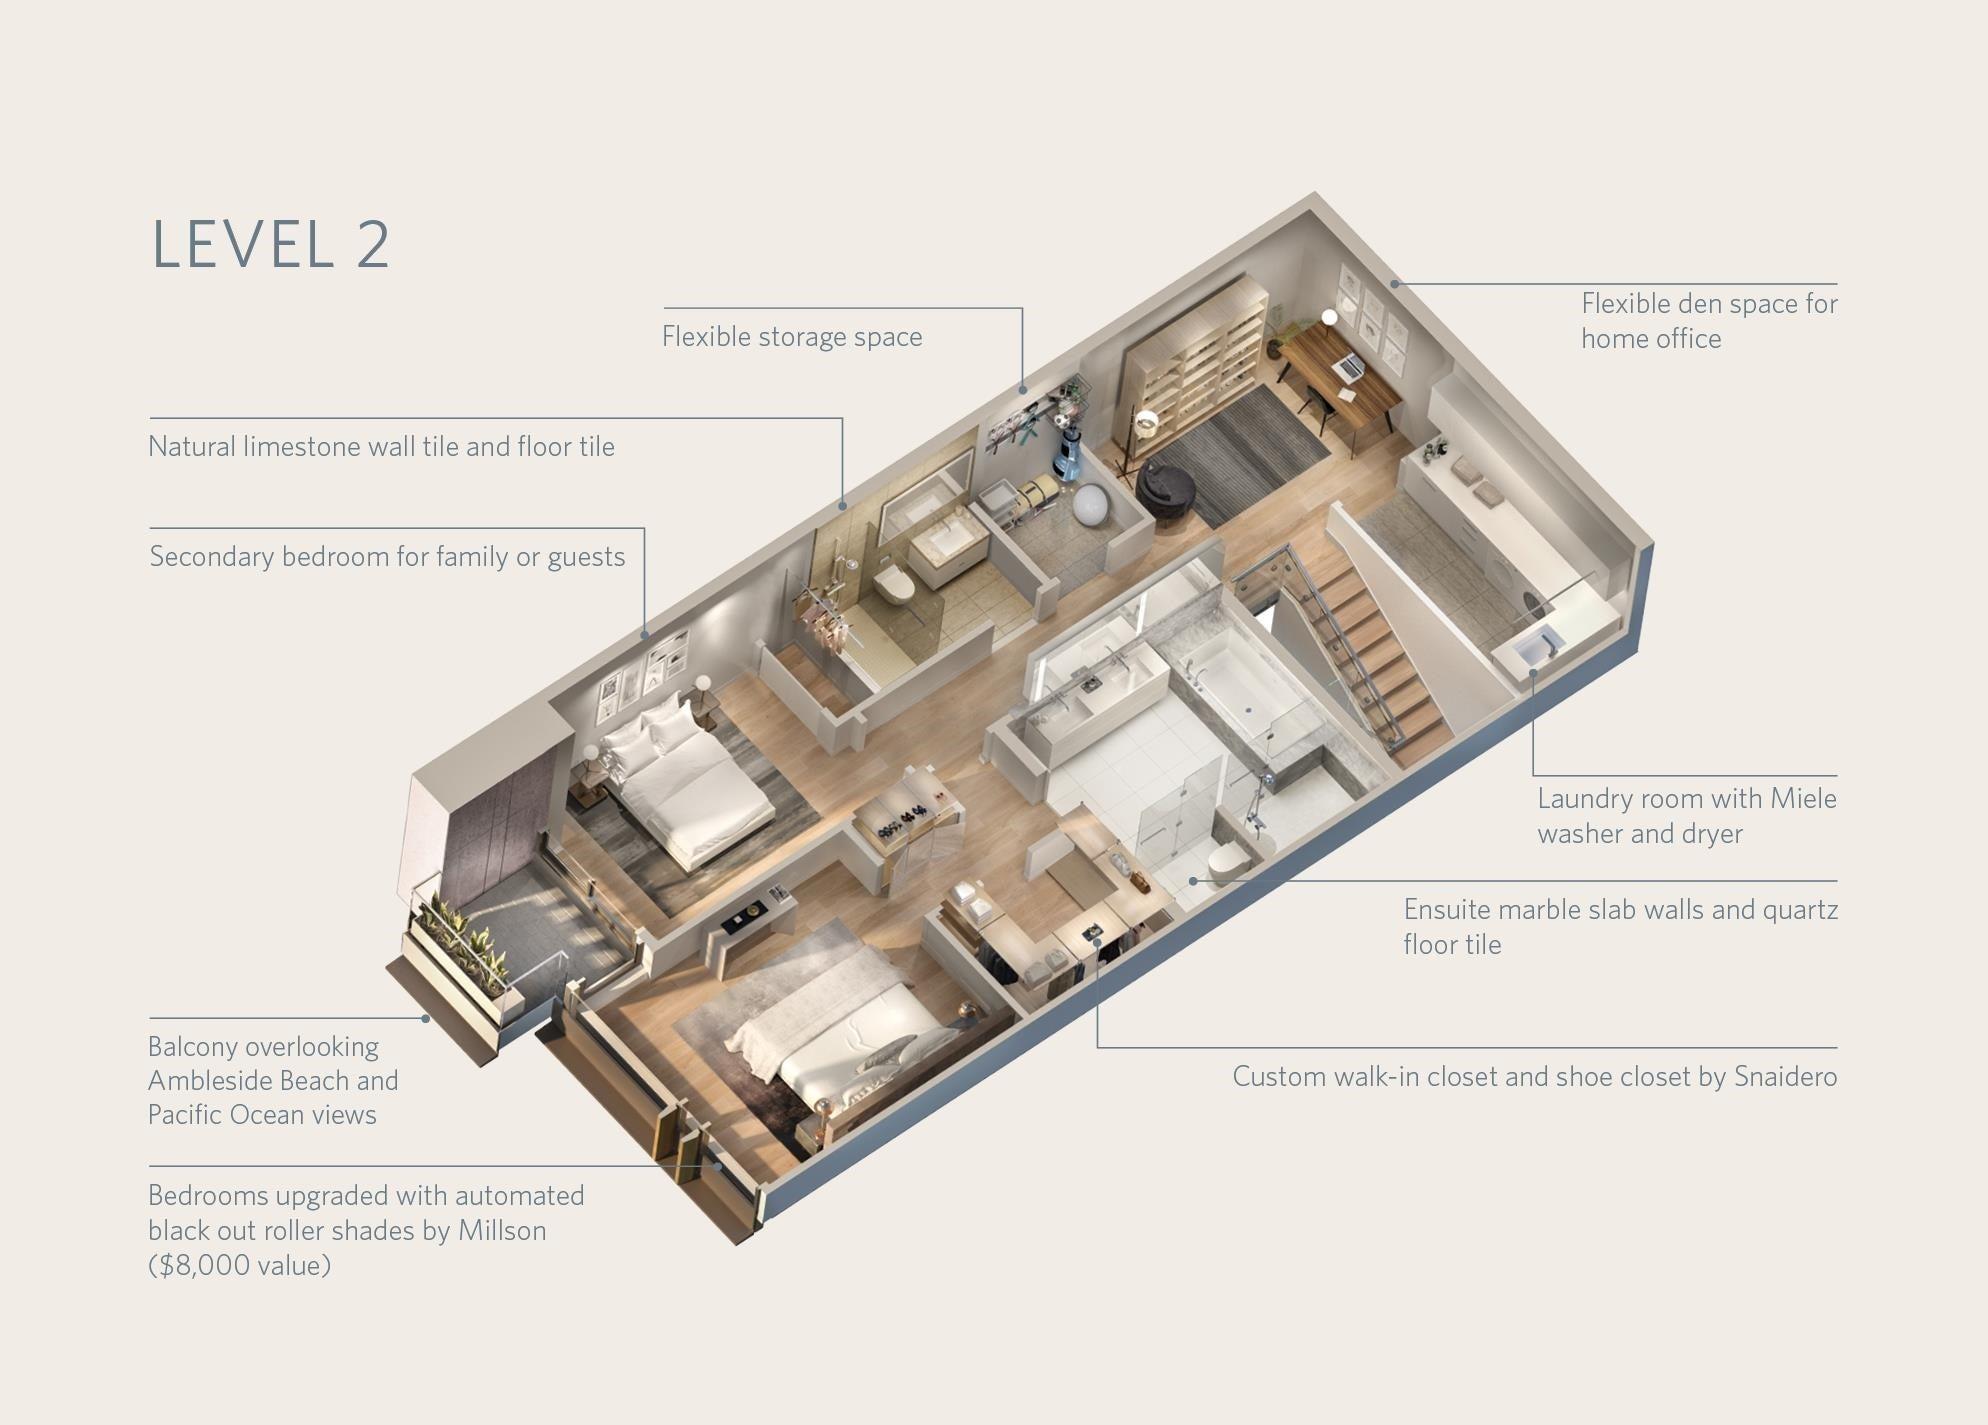 TH102 1327 BELLEVUE AVENUE - Ambleside Townhouse for sale, 2 Bedrooms (R2596338) - #36